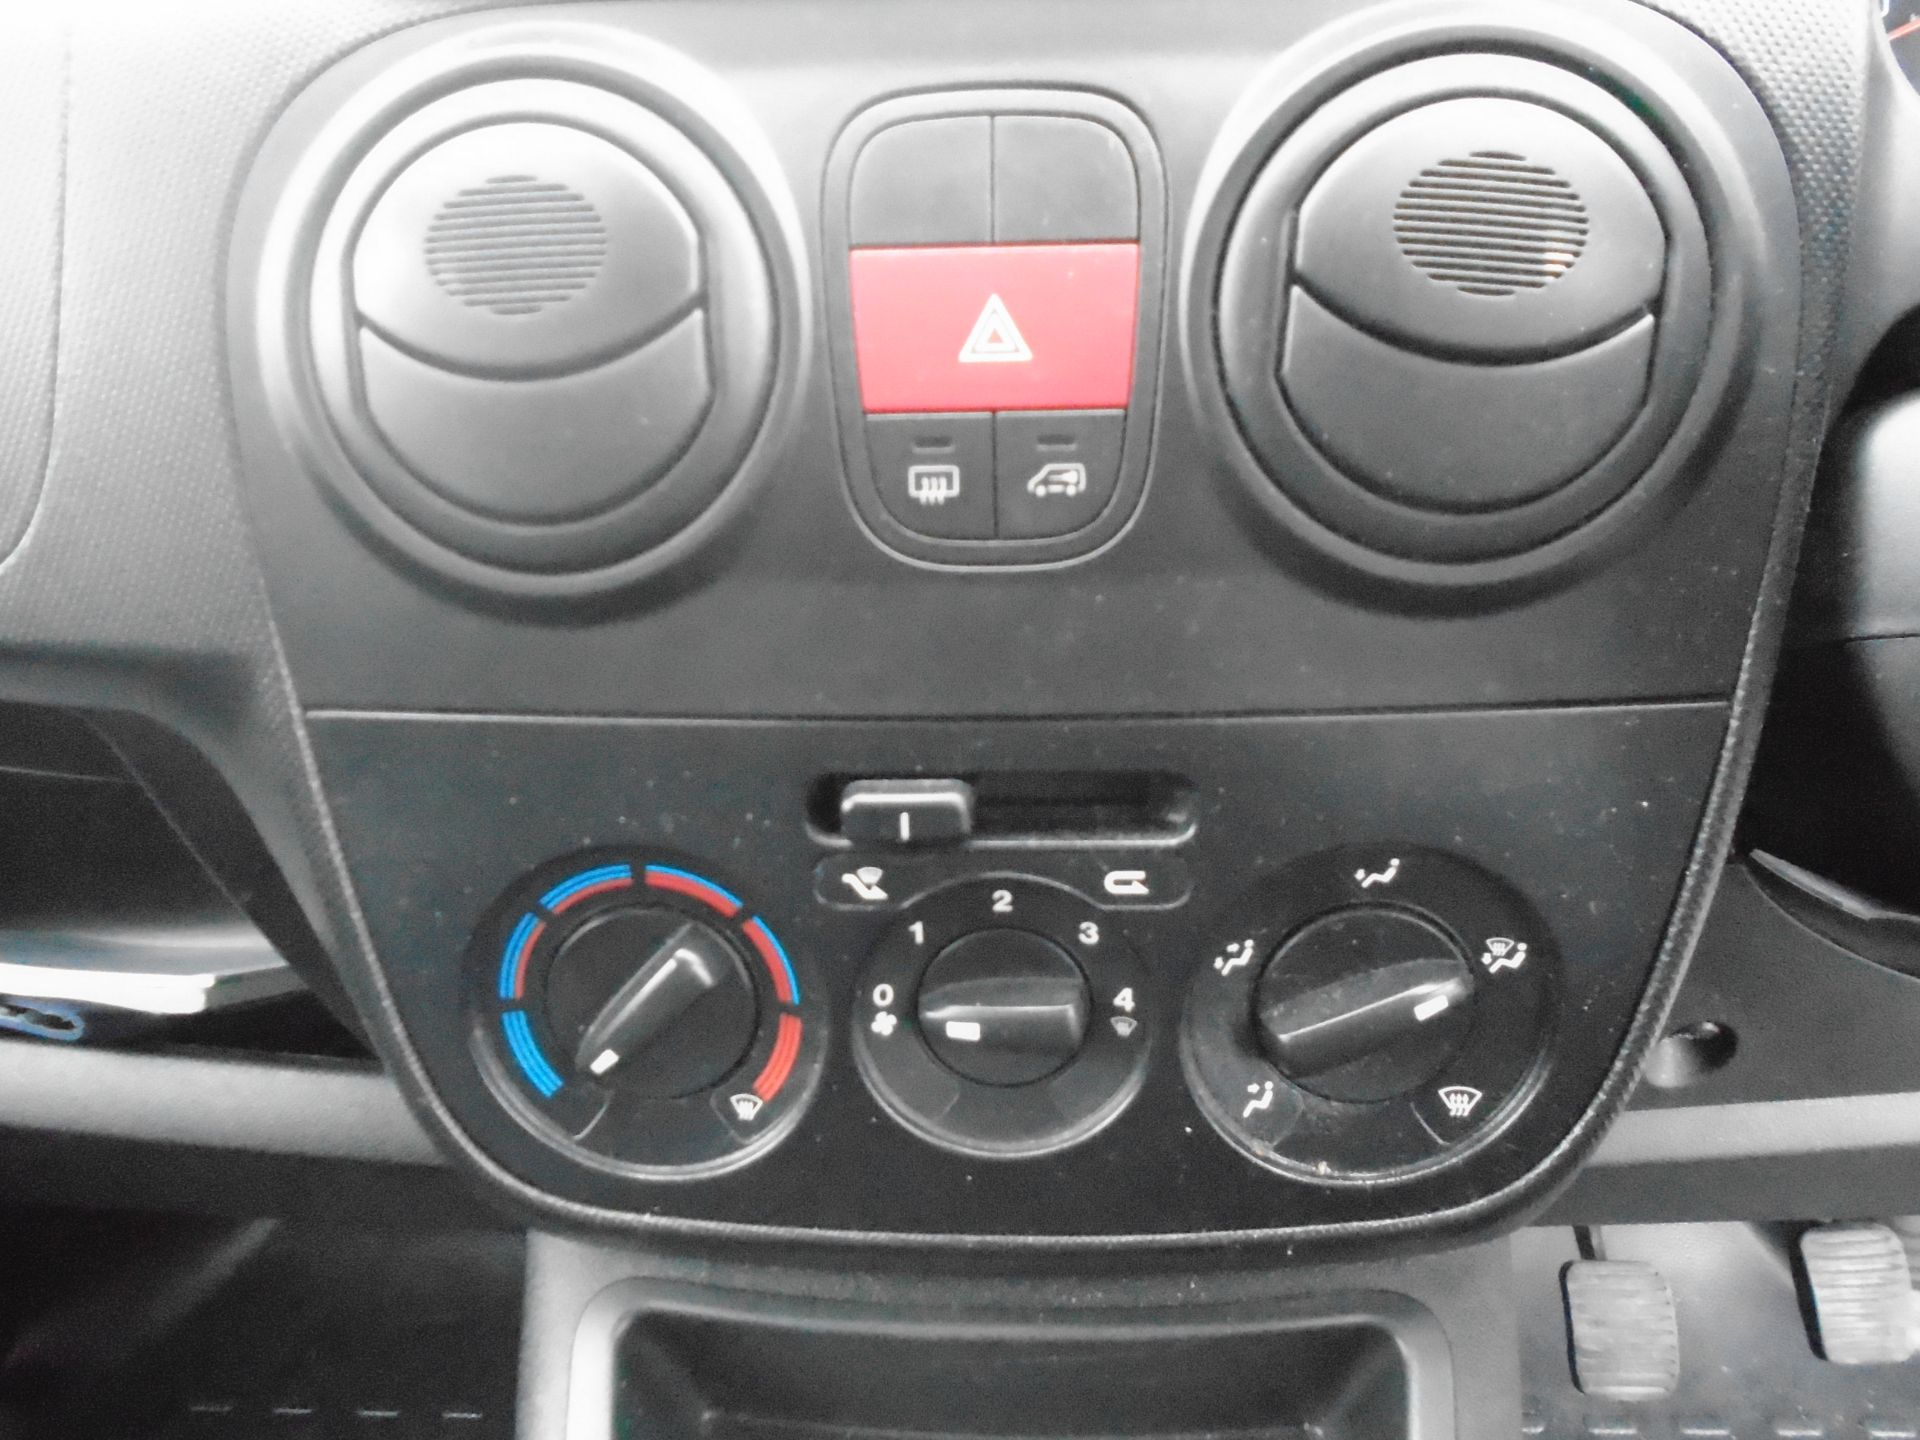 2015 Peugeot Bipper 1.3 Hdi 75 S Plus Pack [Sld] (NU65EBC) Image 19